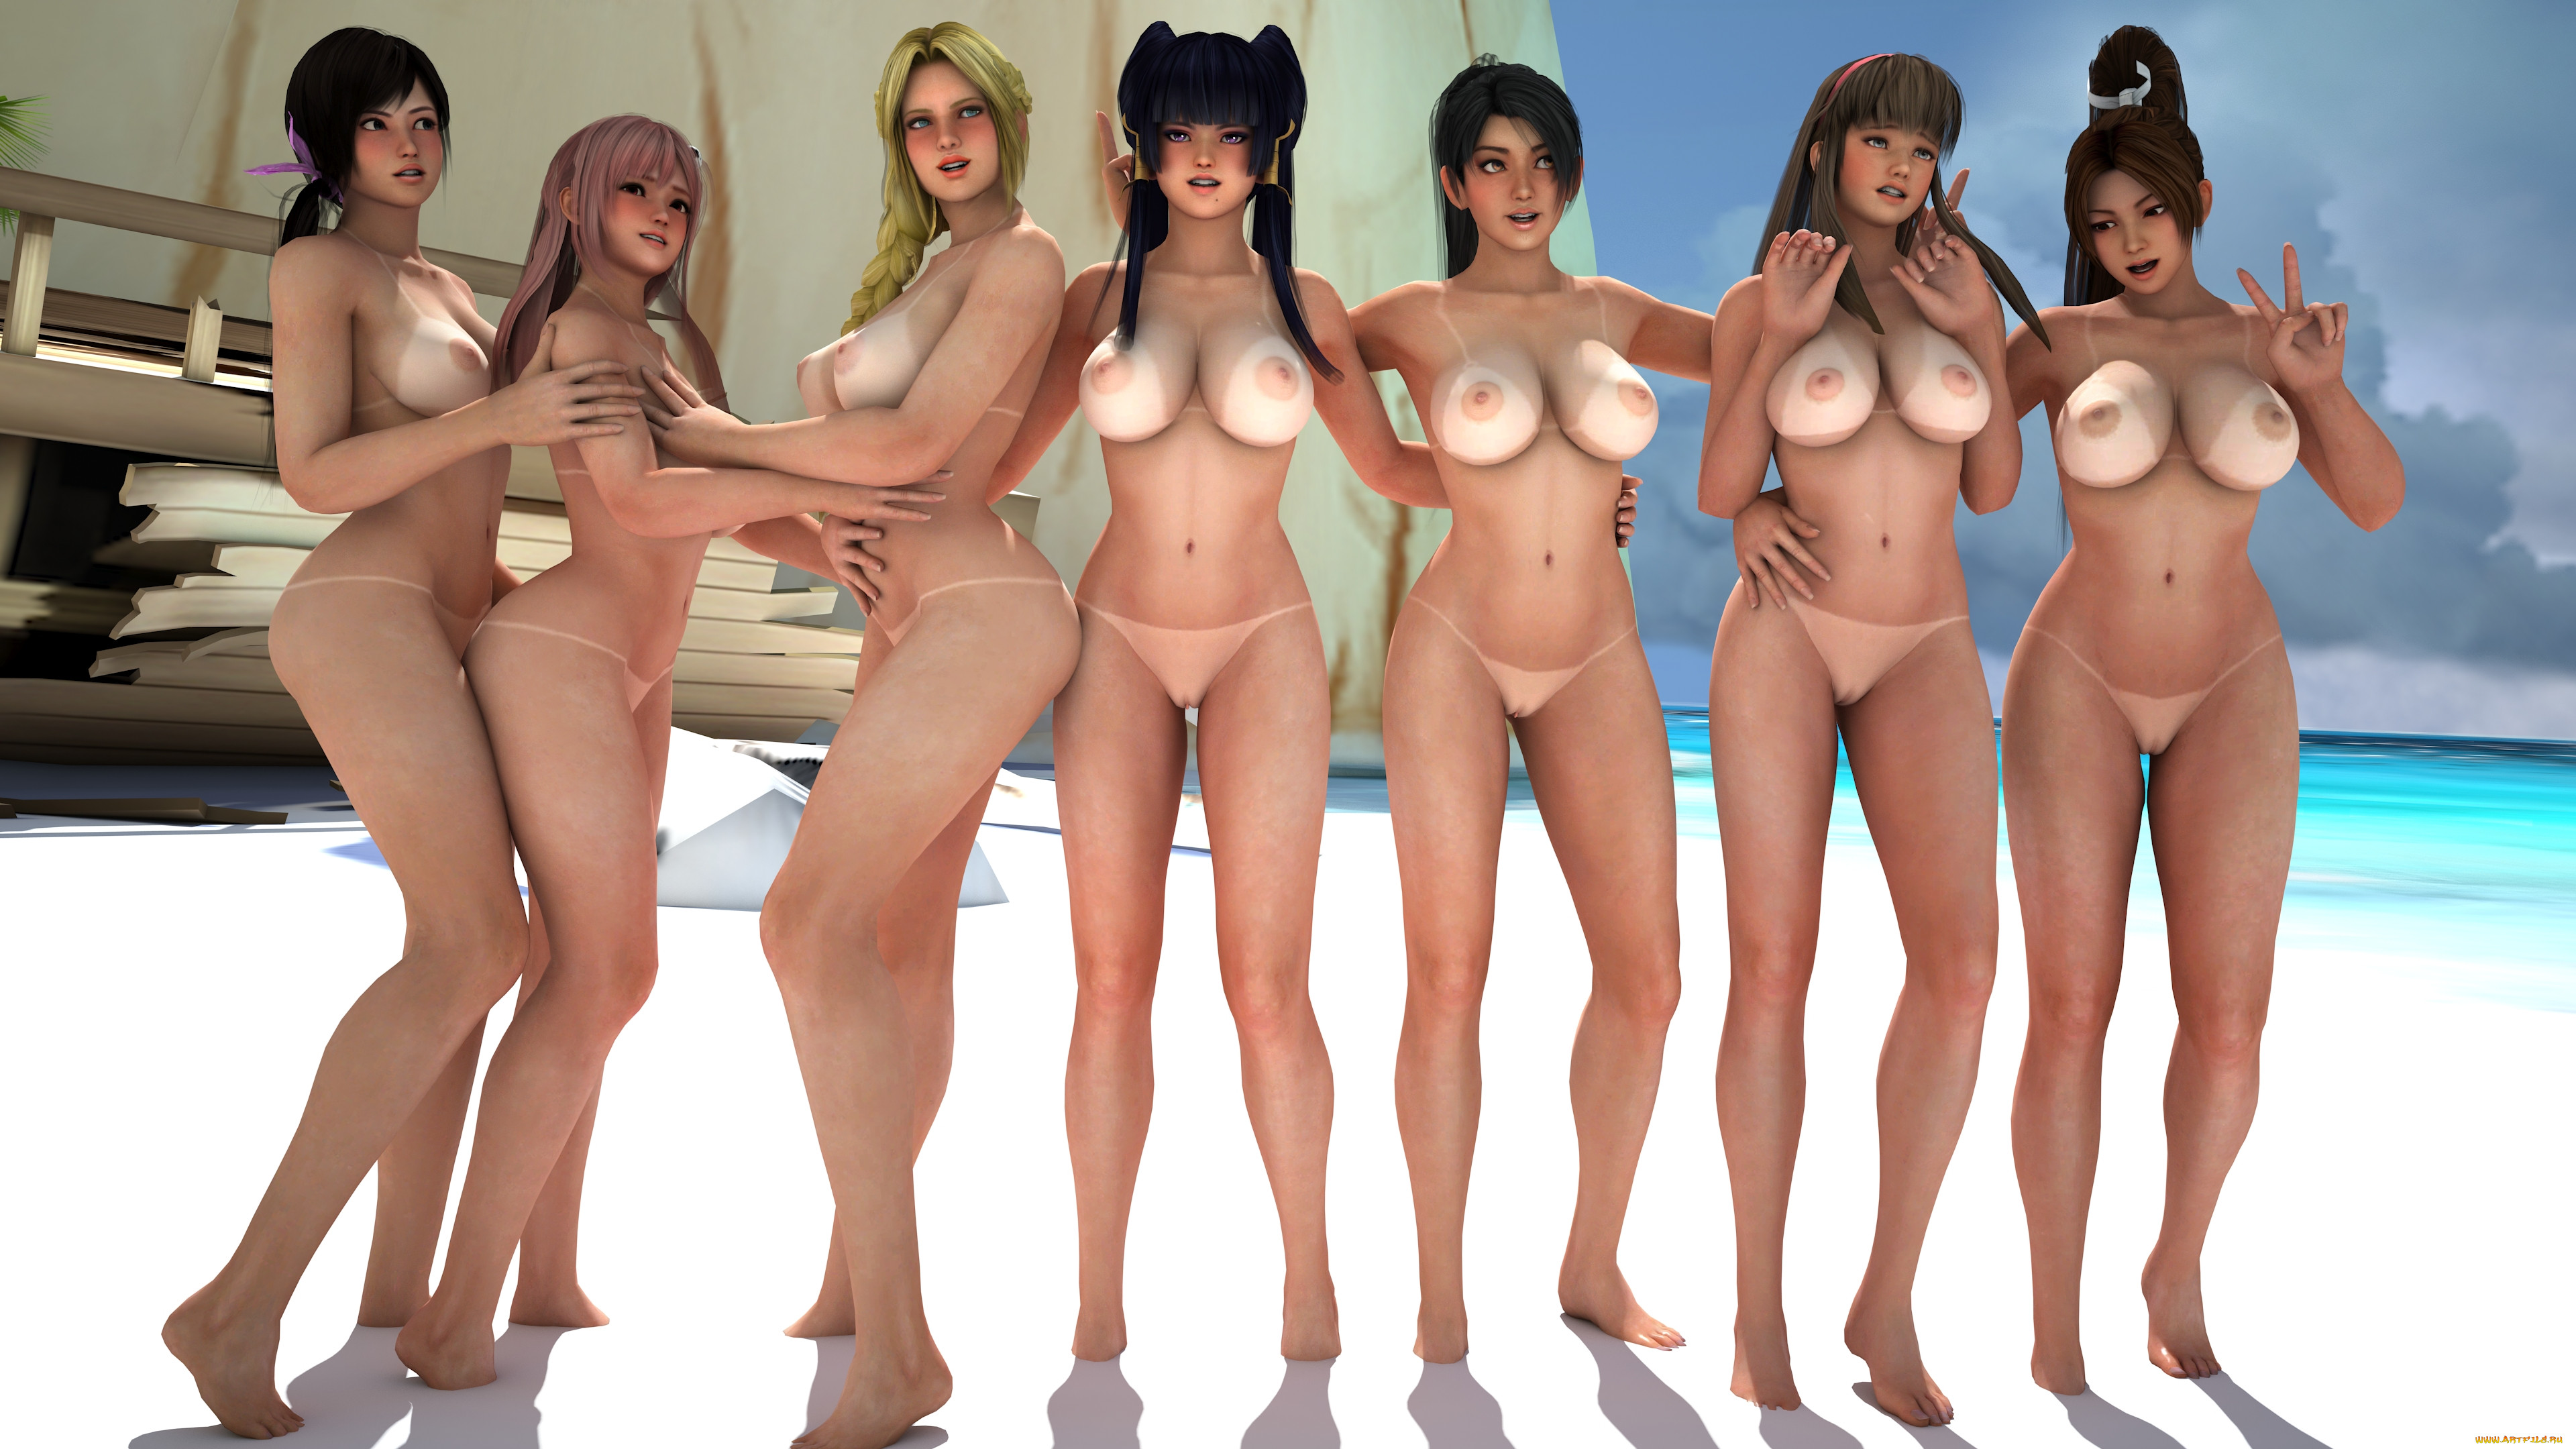 Hot nude game girls